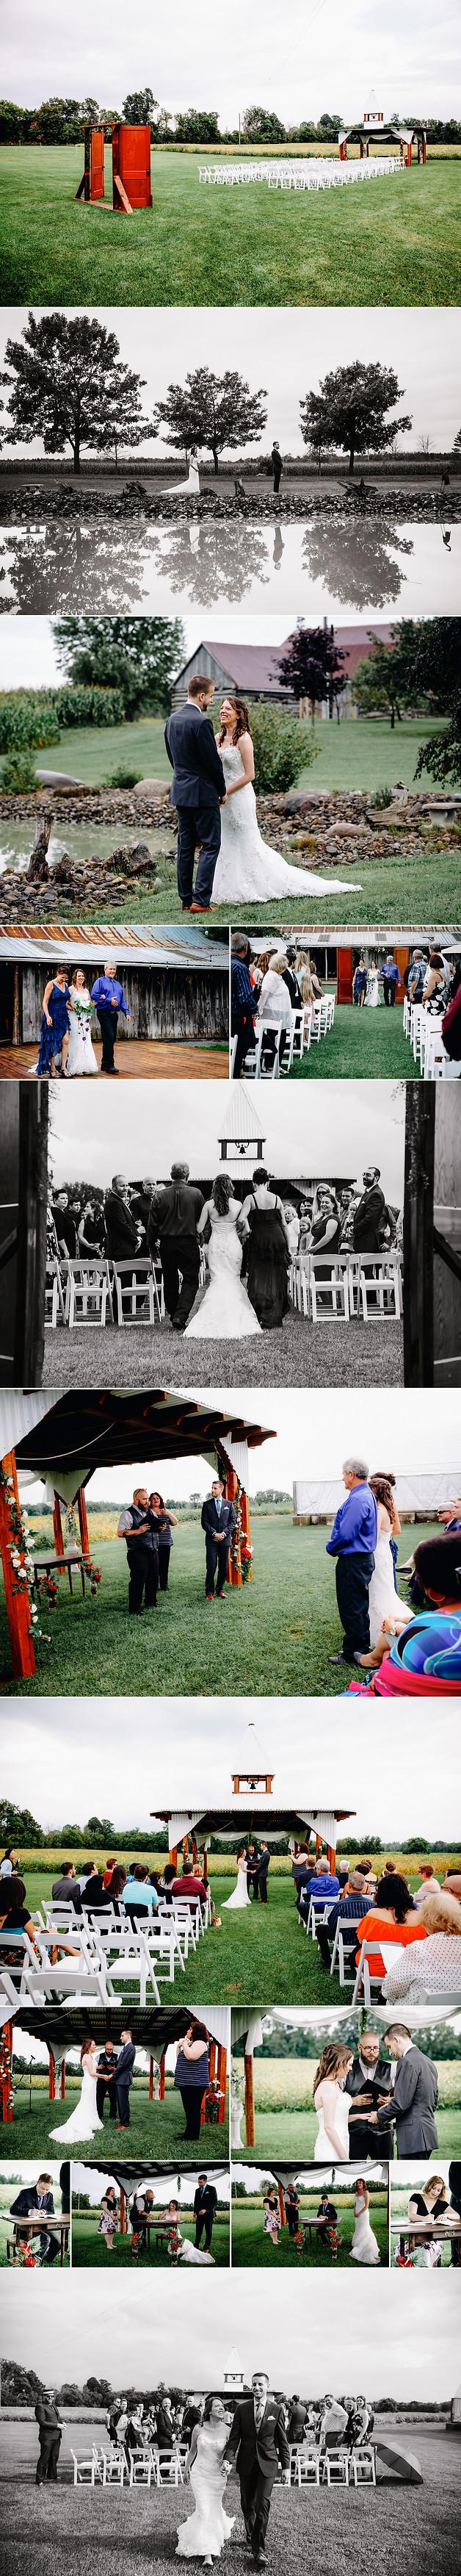 Carolle Collages 1.jpg